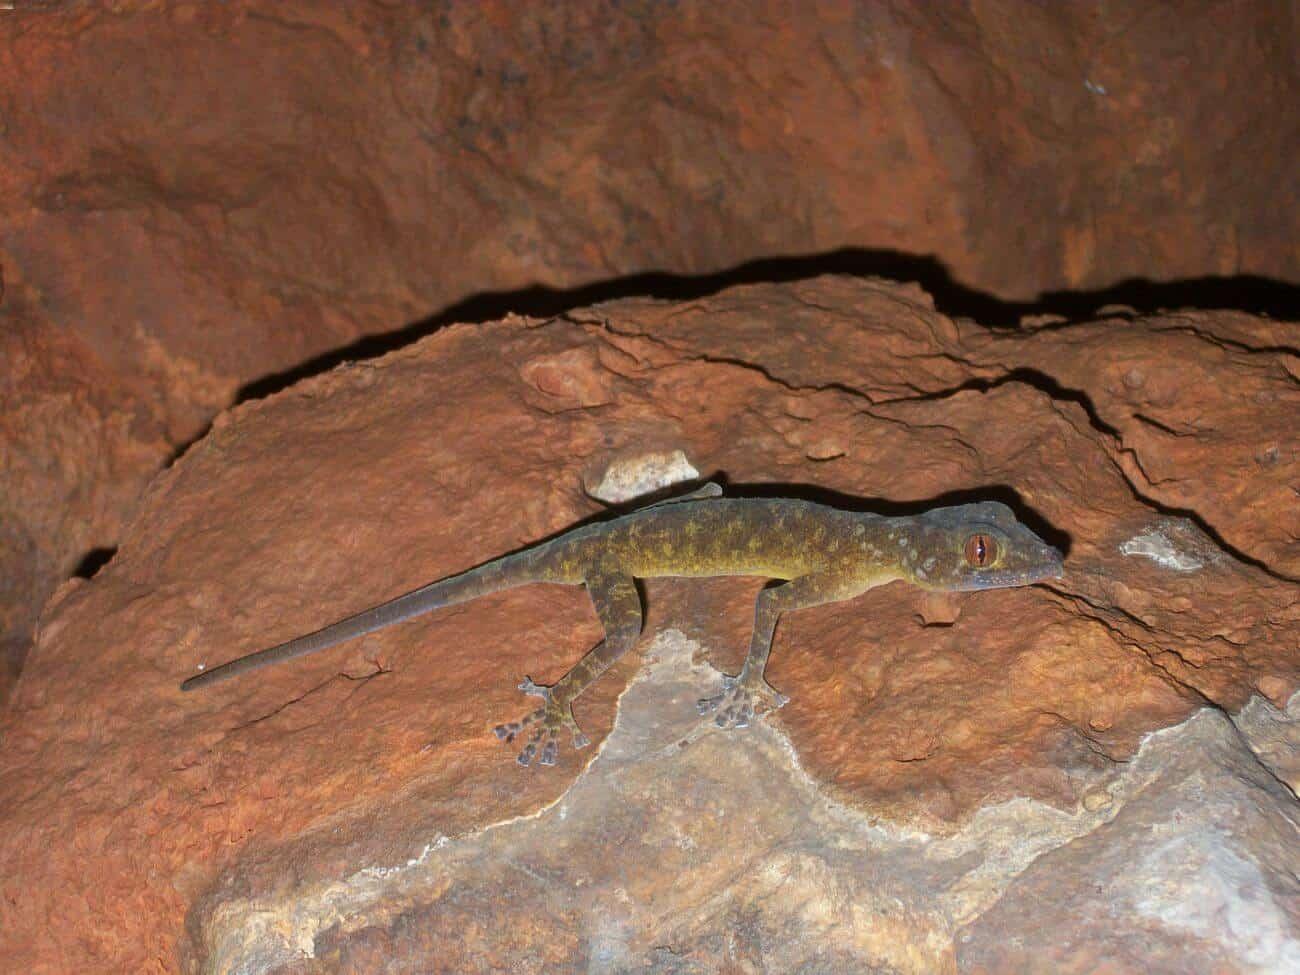 Golden gecko in its natural habitat